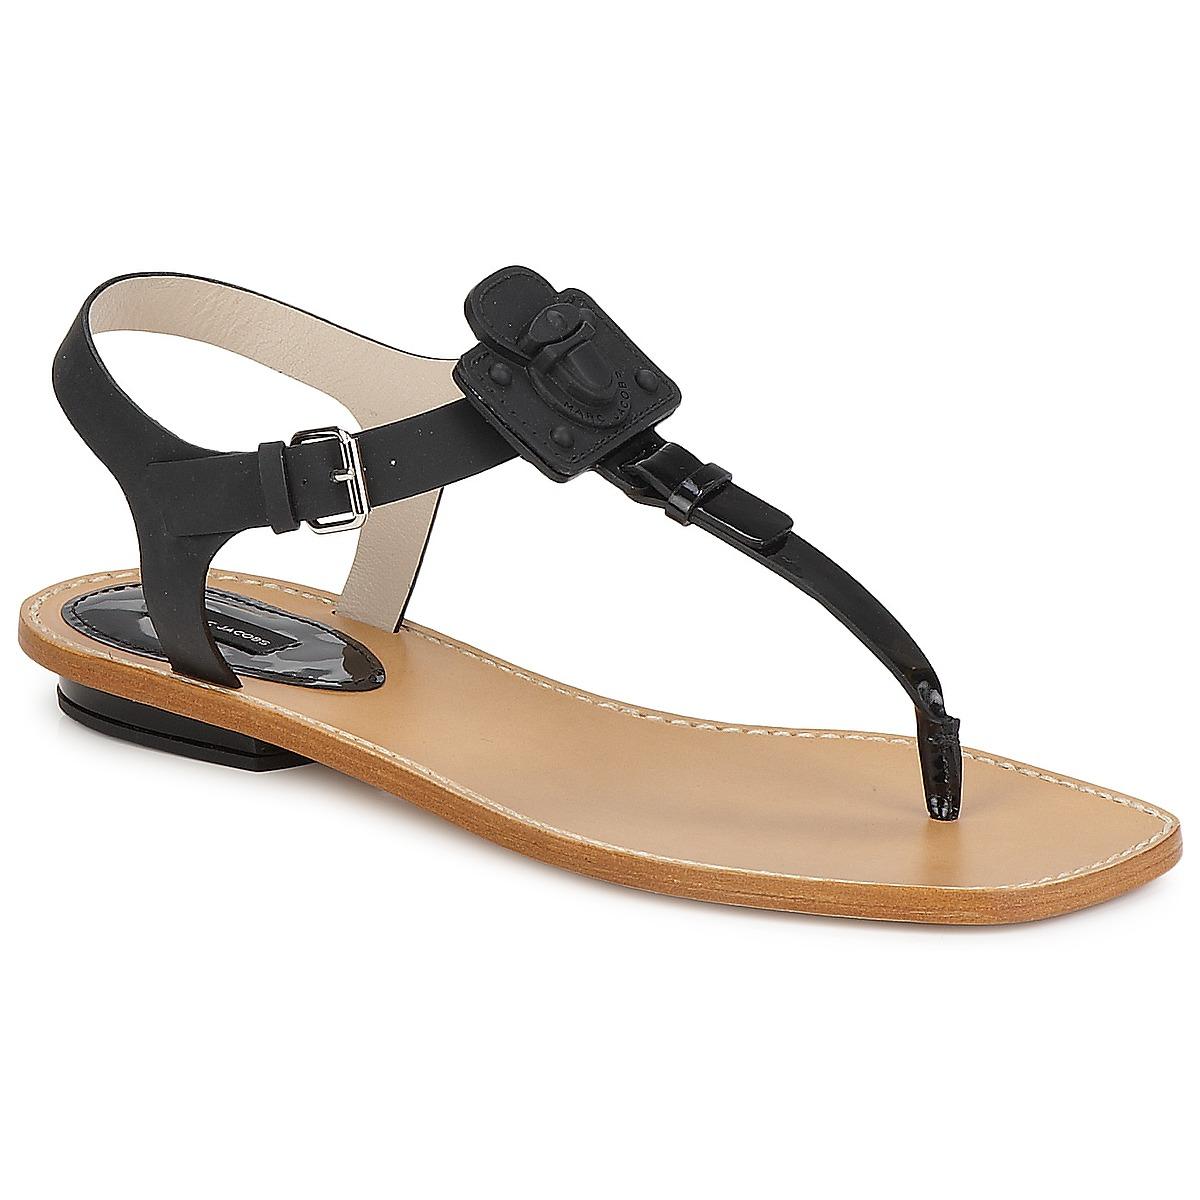 Marc Jacobs CHIC CALF Schwarz - Kostenloser Versand bei Spartoode ! - Schuhe Sandalen / Sandaletten Damen 247,50 €